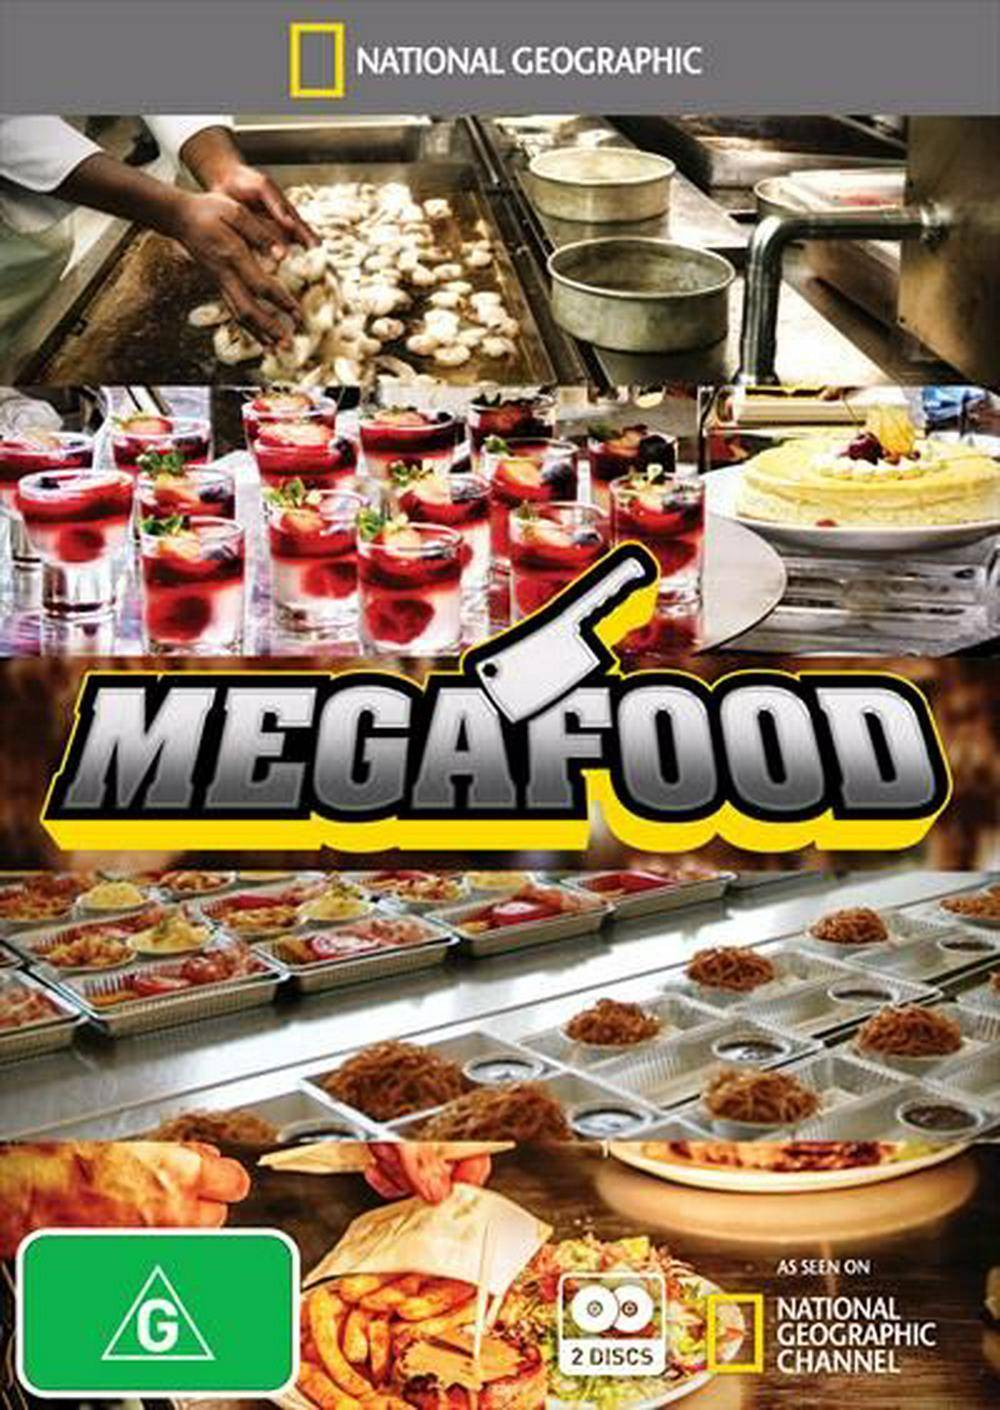 National Geographic - Mega Food: Series 1 (2012)